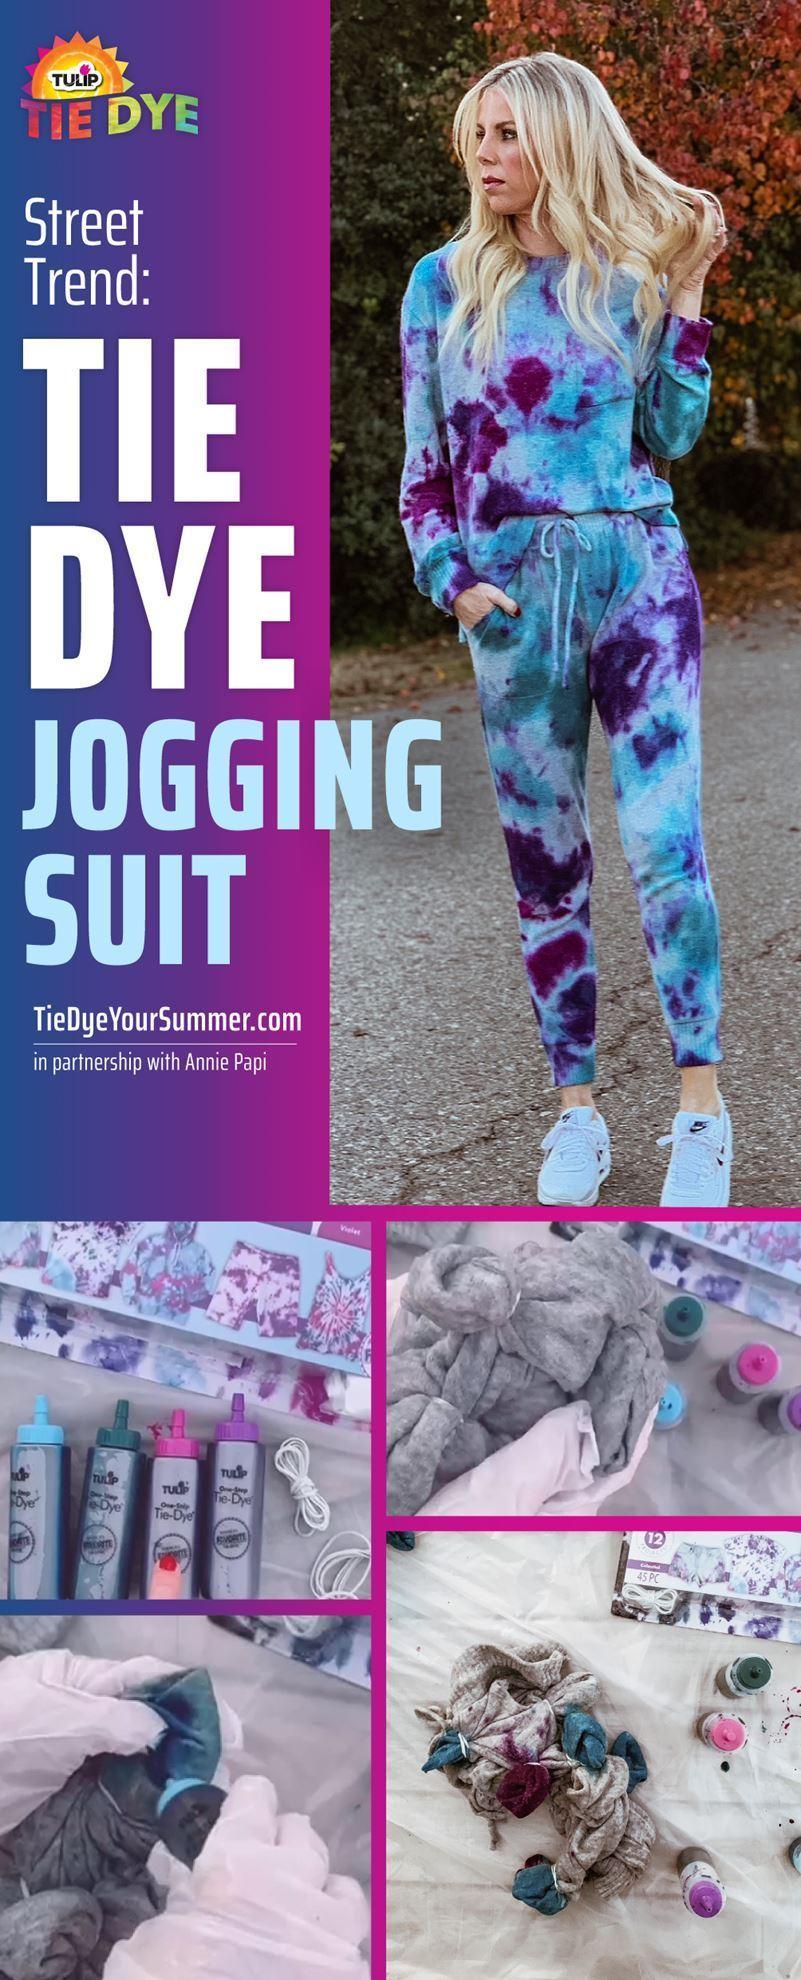 Street Trend: Tie-Dye Jogging Suit